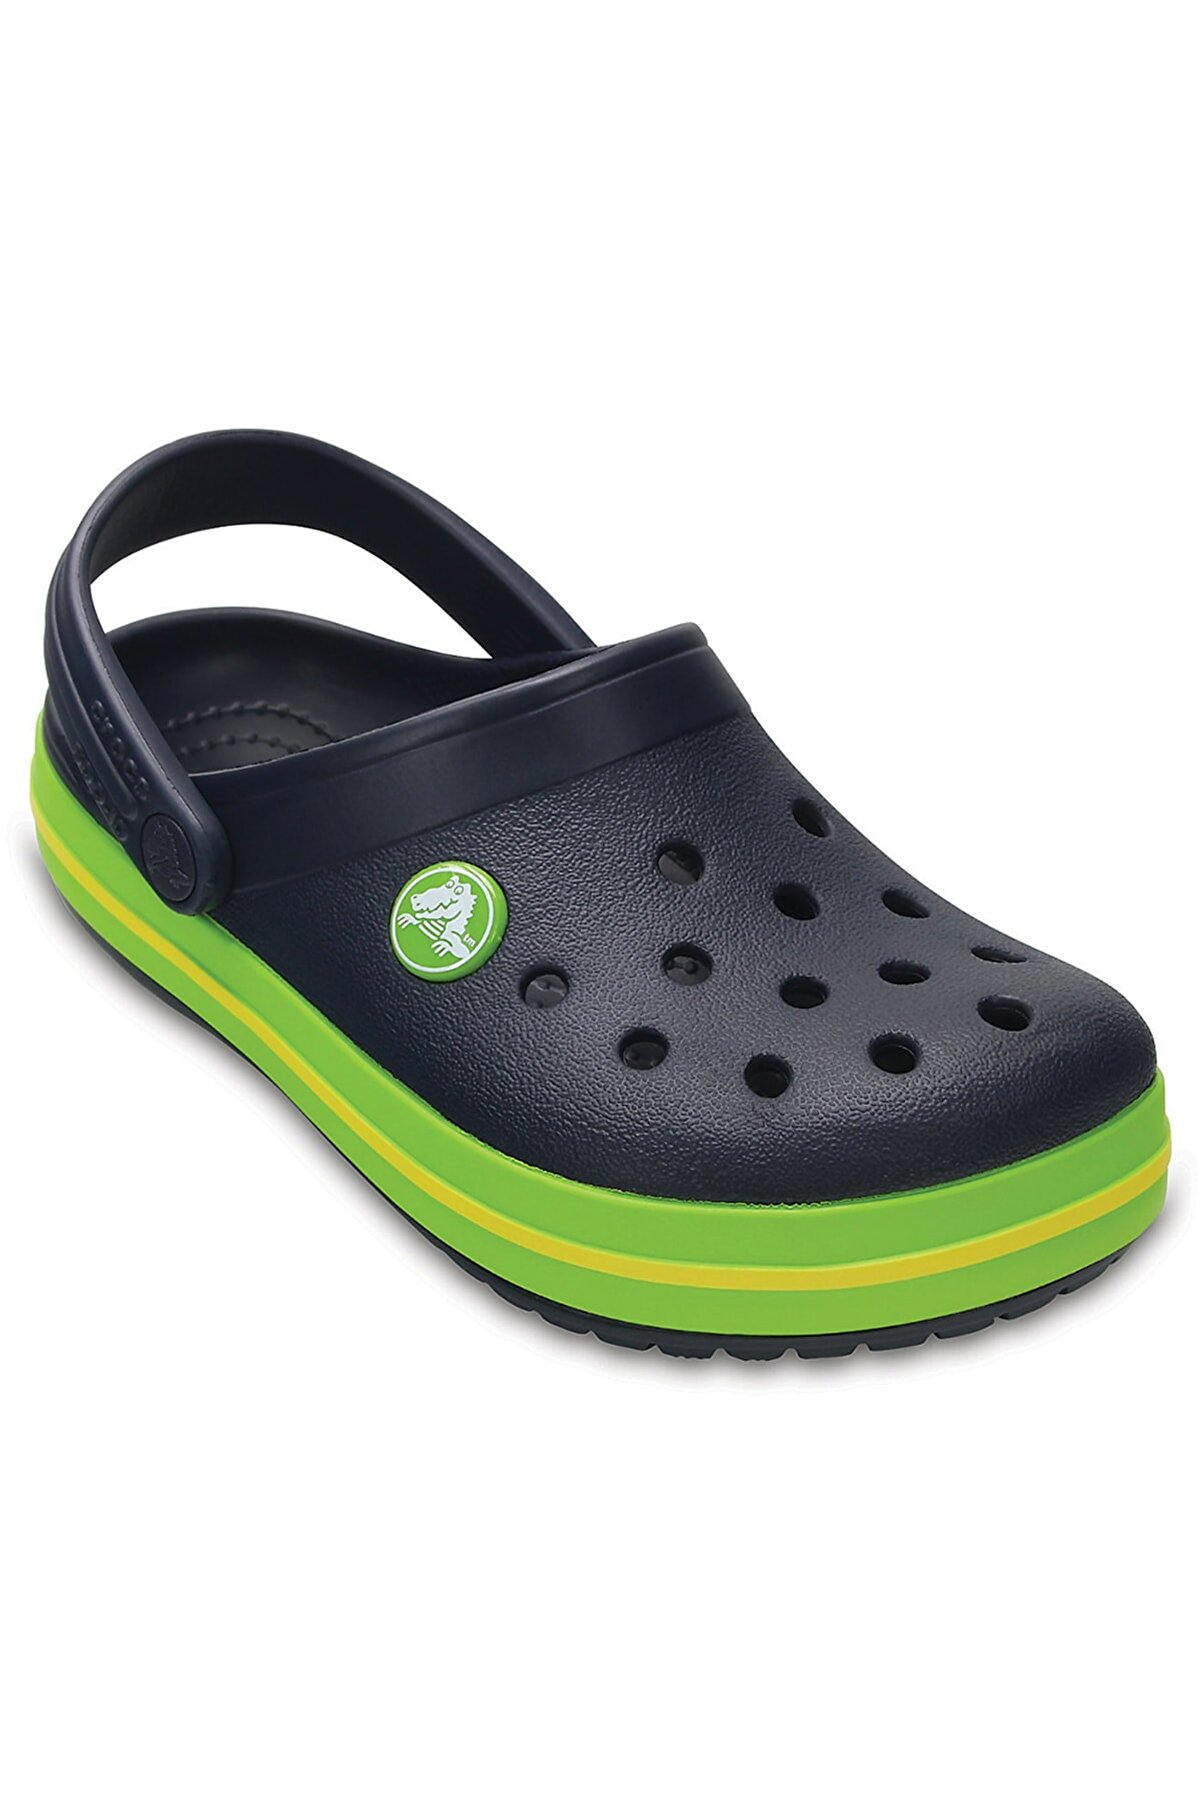 Crocs CROCBAND KIDS Lacivert Unisex Çocuk Terlik 100528610